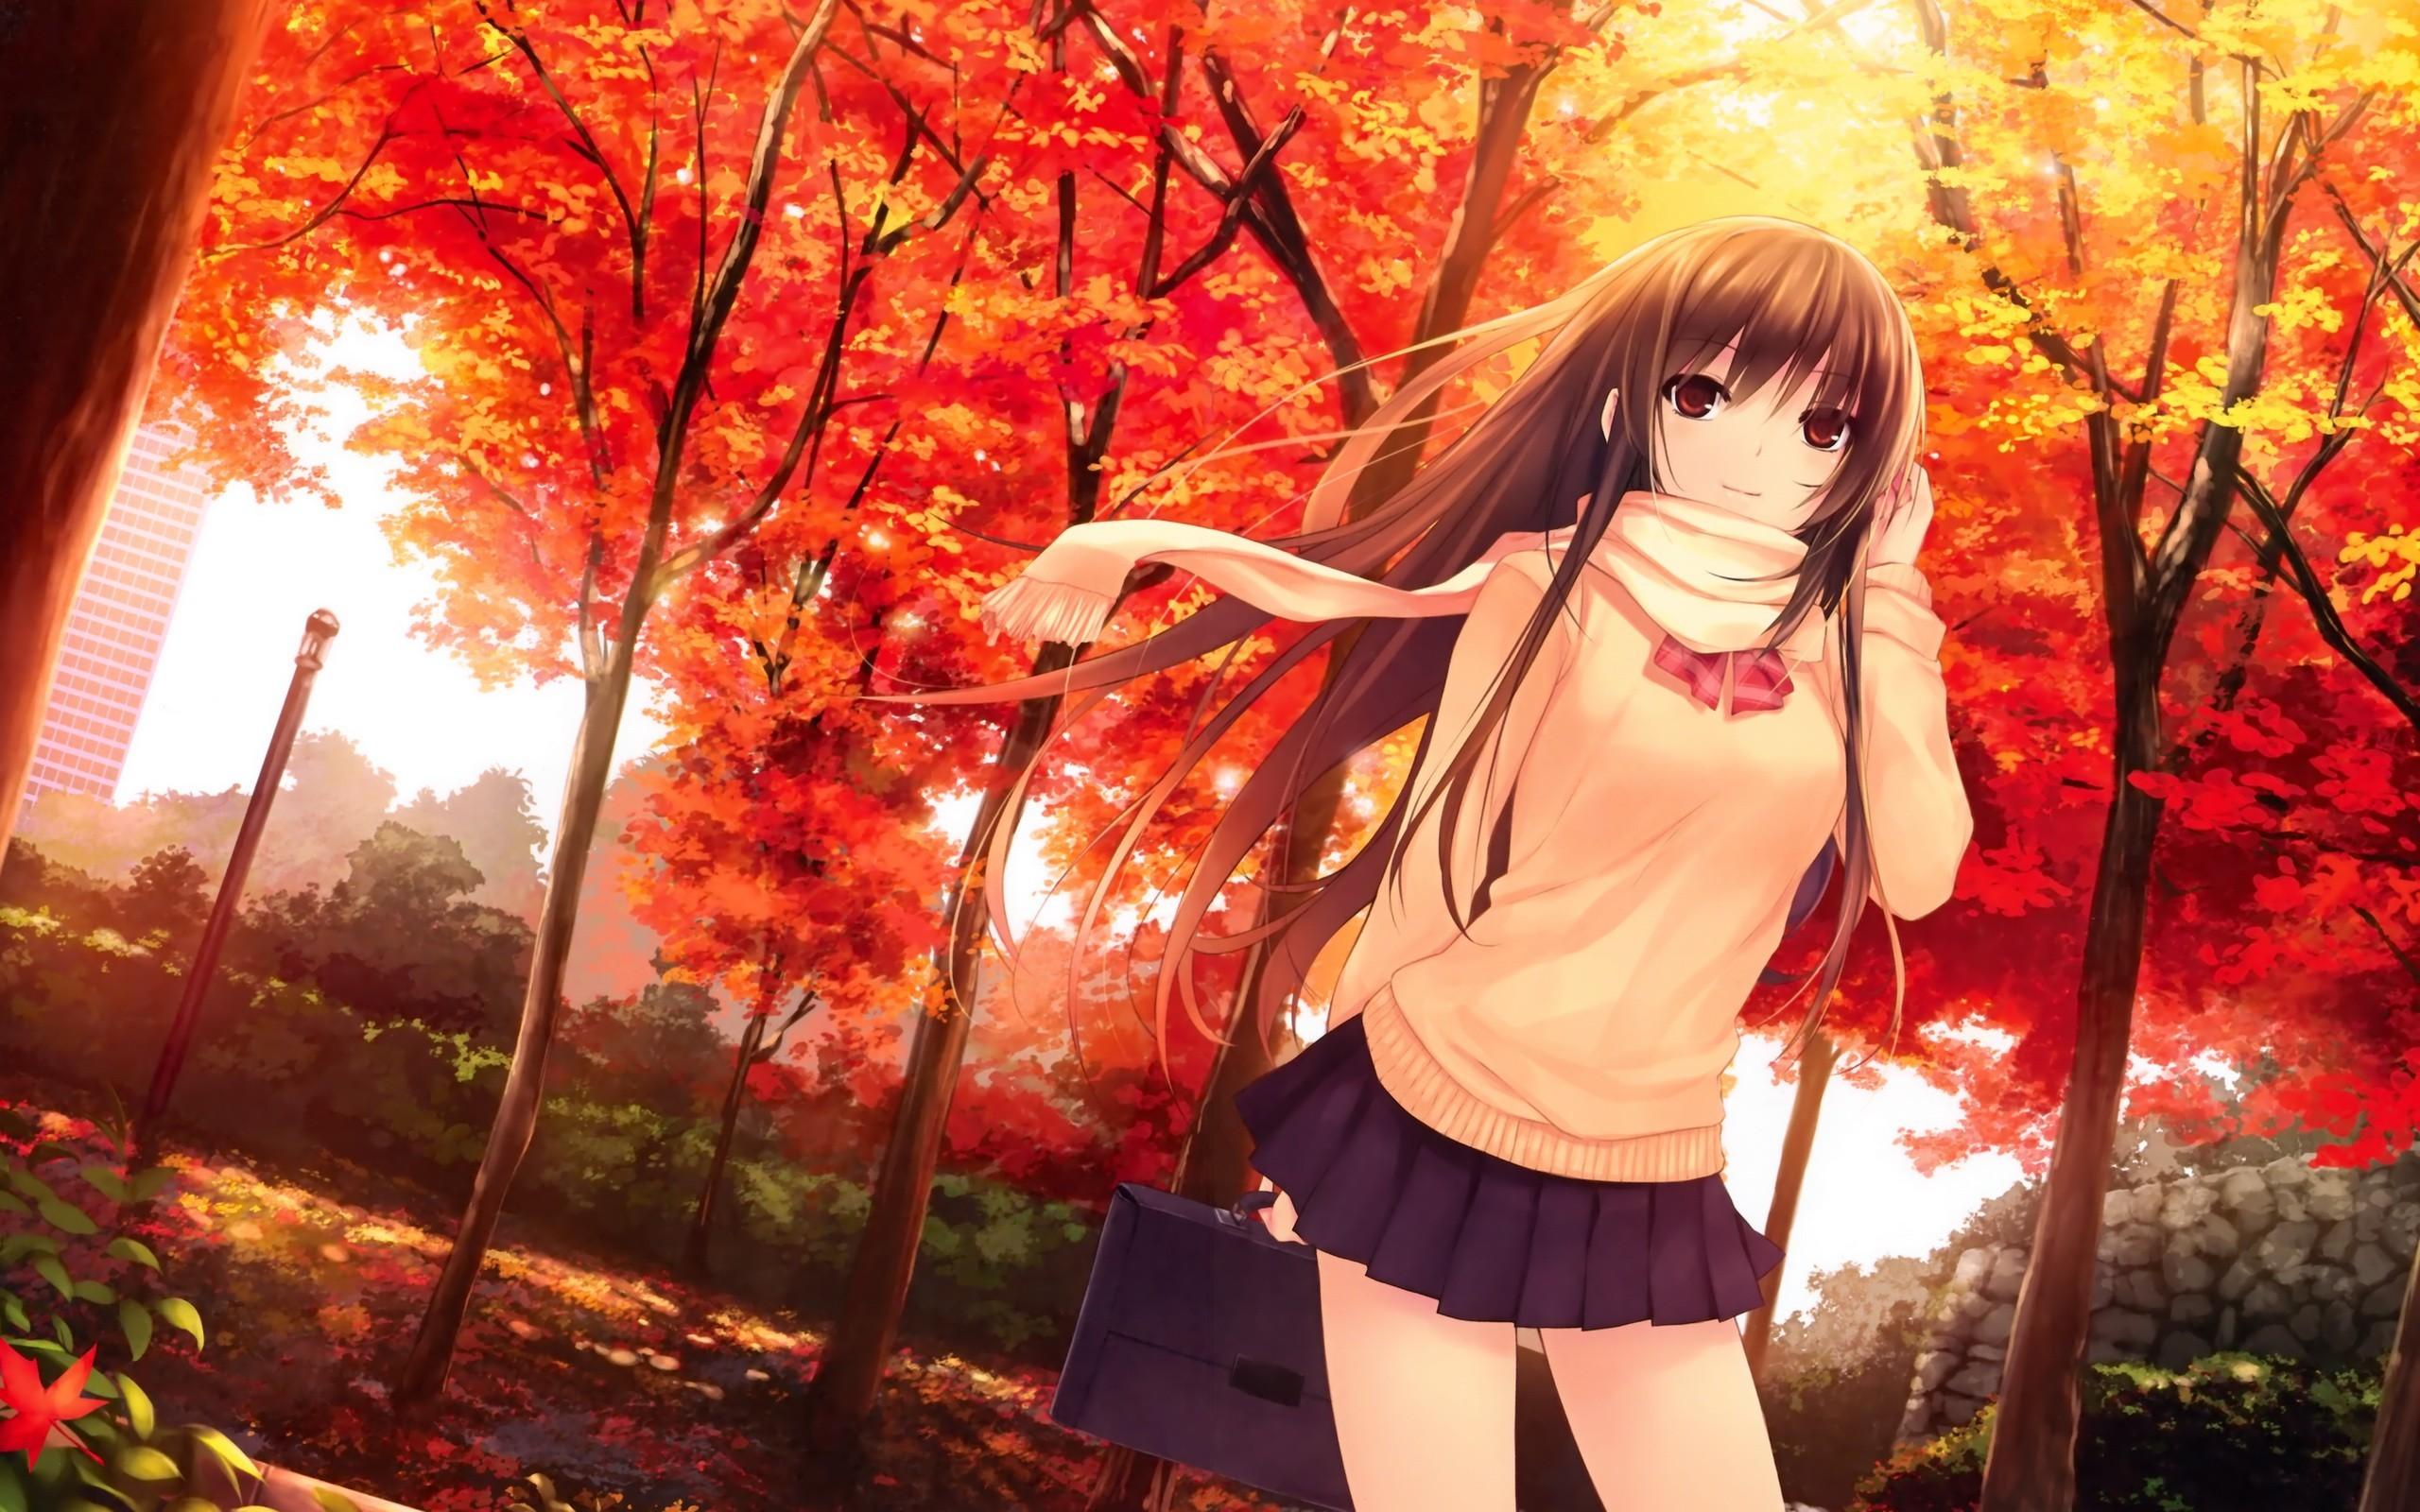 Anime Girls Autumn Bows Brunettes Buildings Coffee-Kizoku Leaves Long Hair  Red Eyes Scarfs School Uniforms Trees